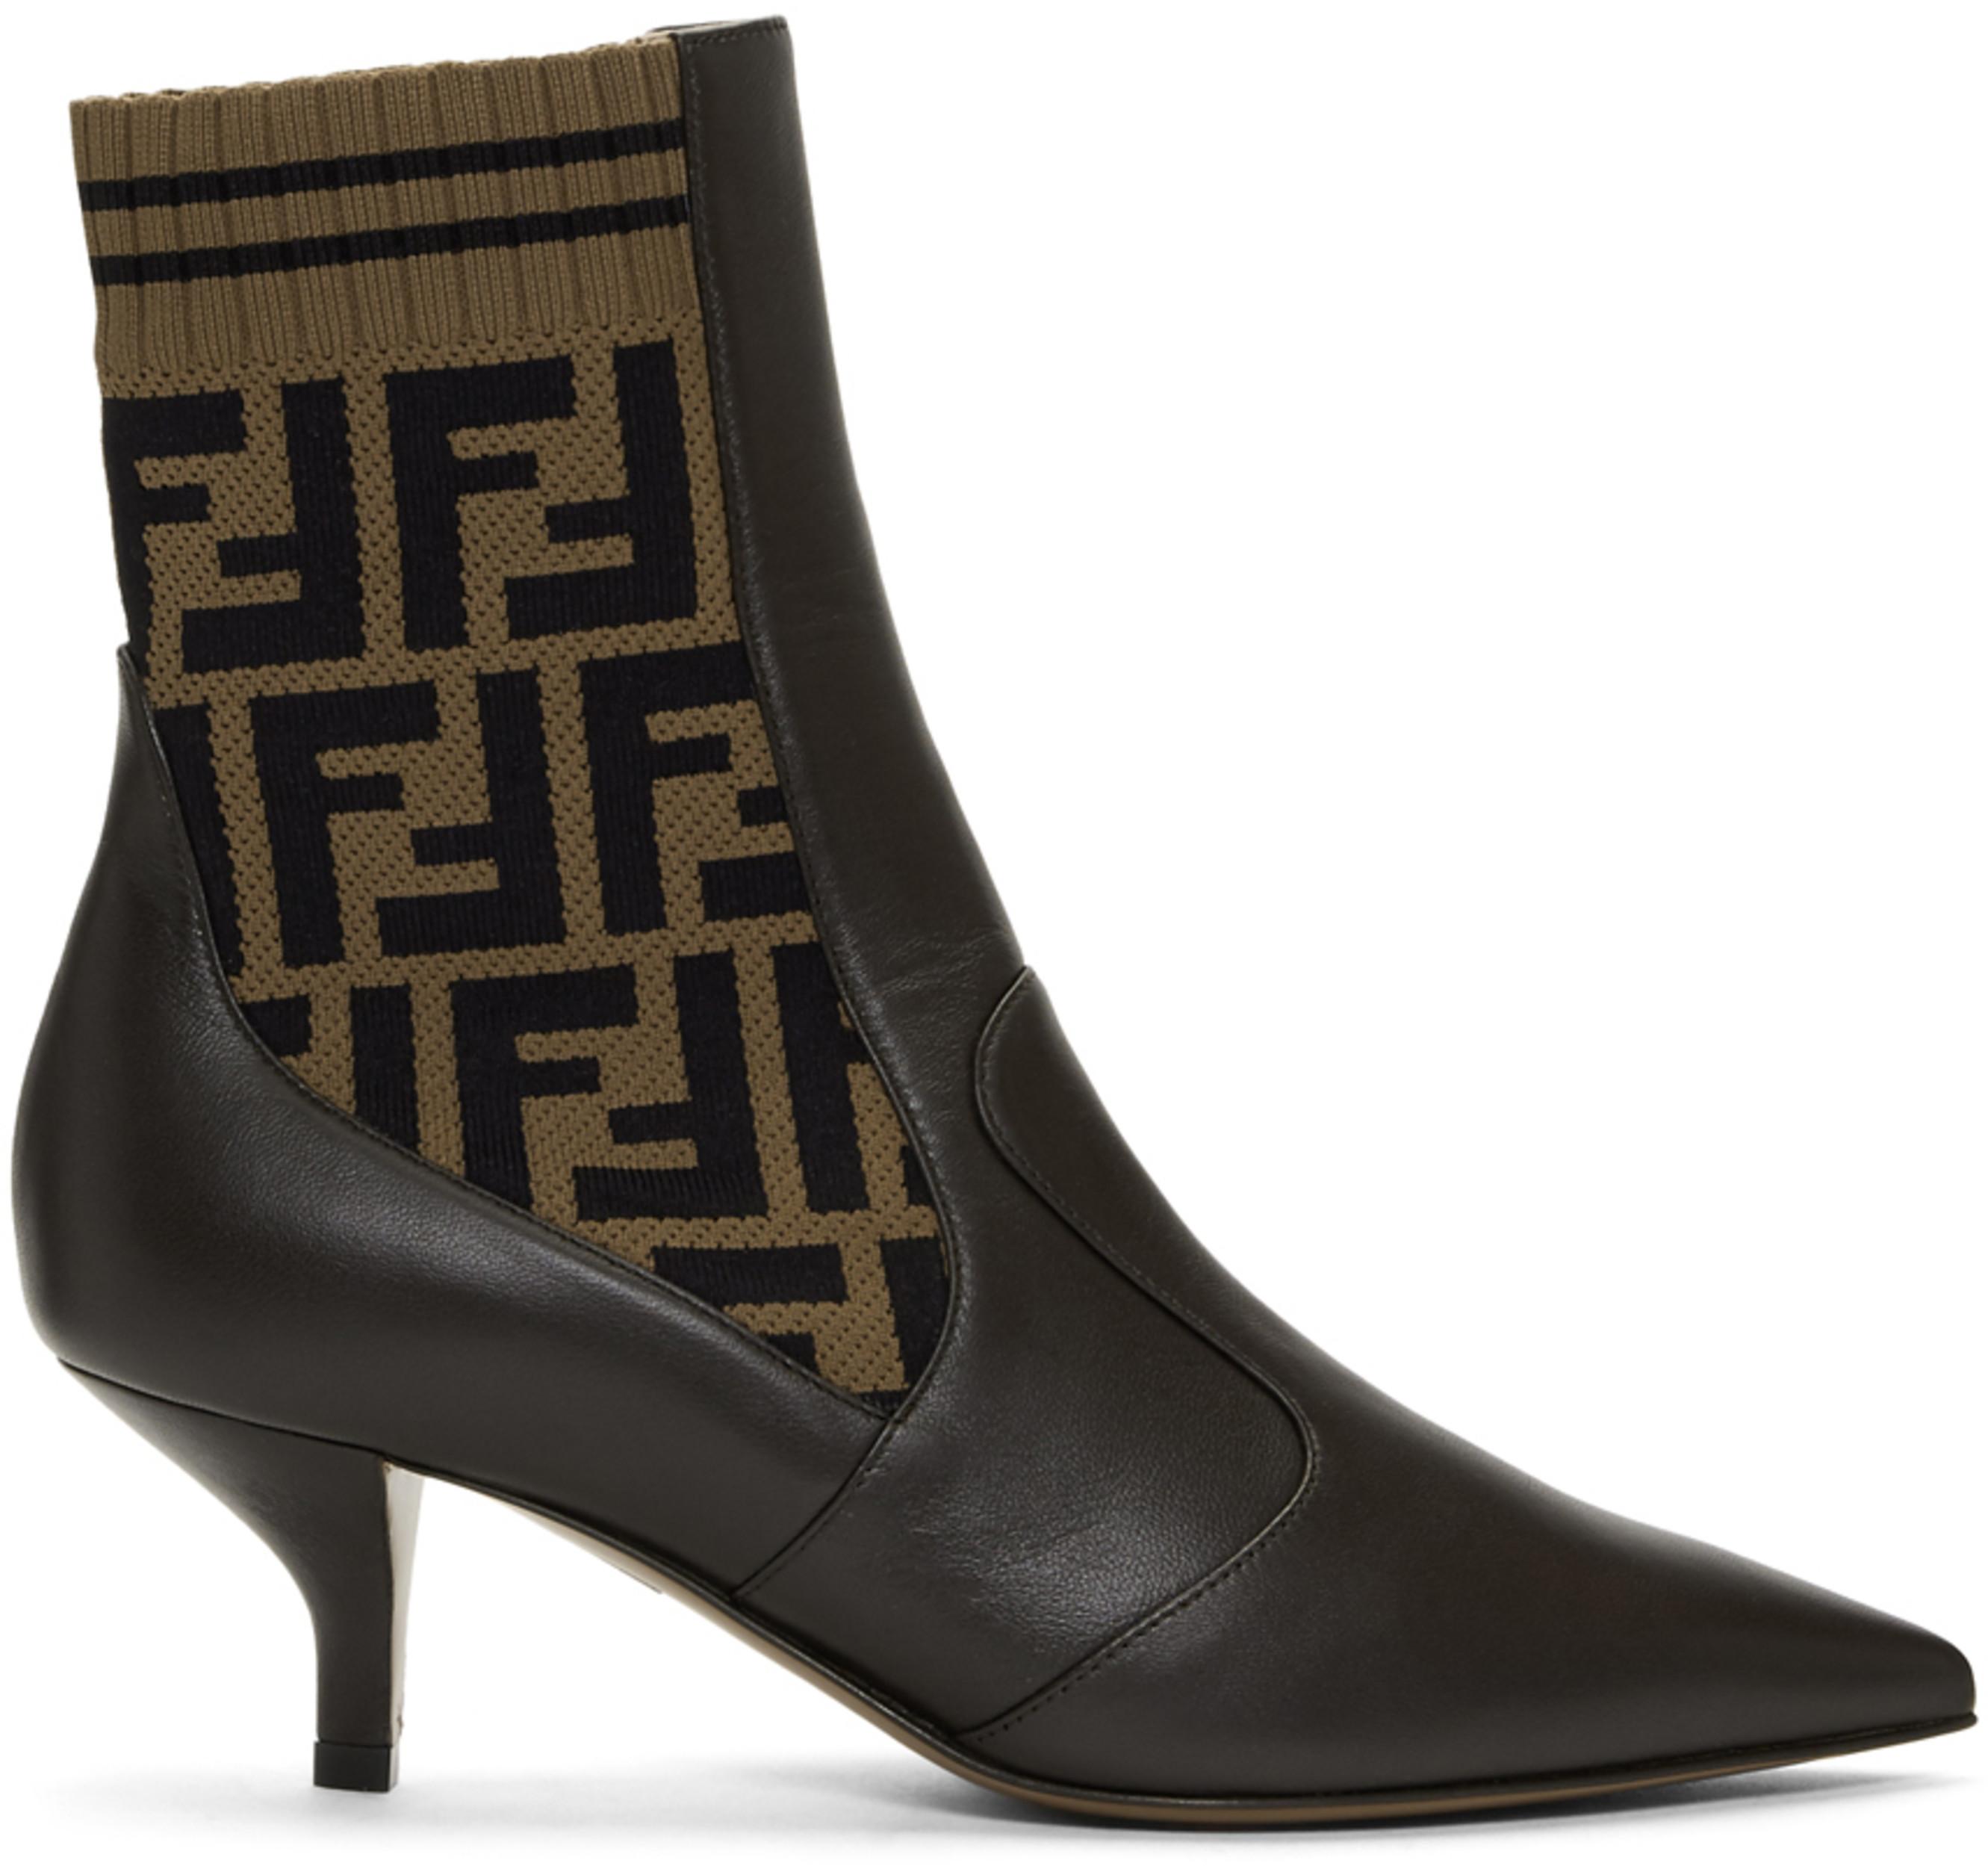 05a6d0d6d9c Brown 'Forever Fendi' Rockoko Boots